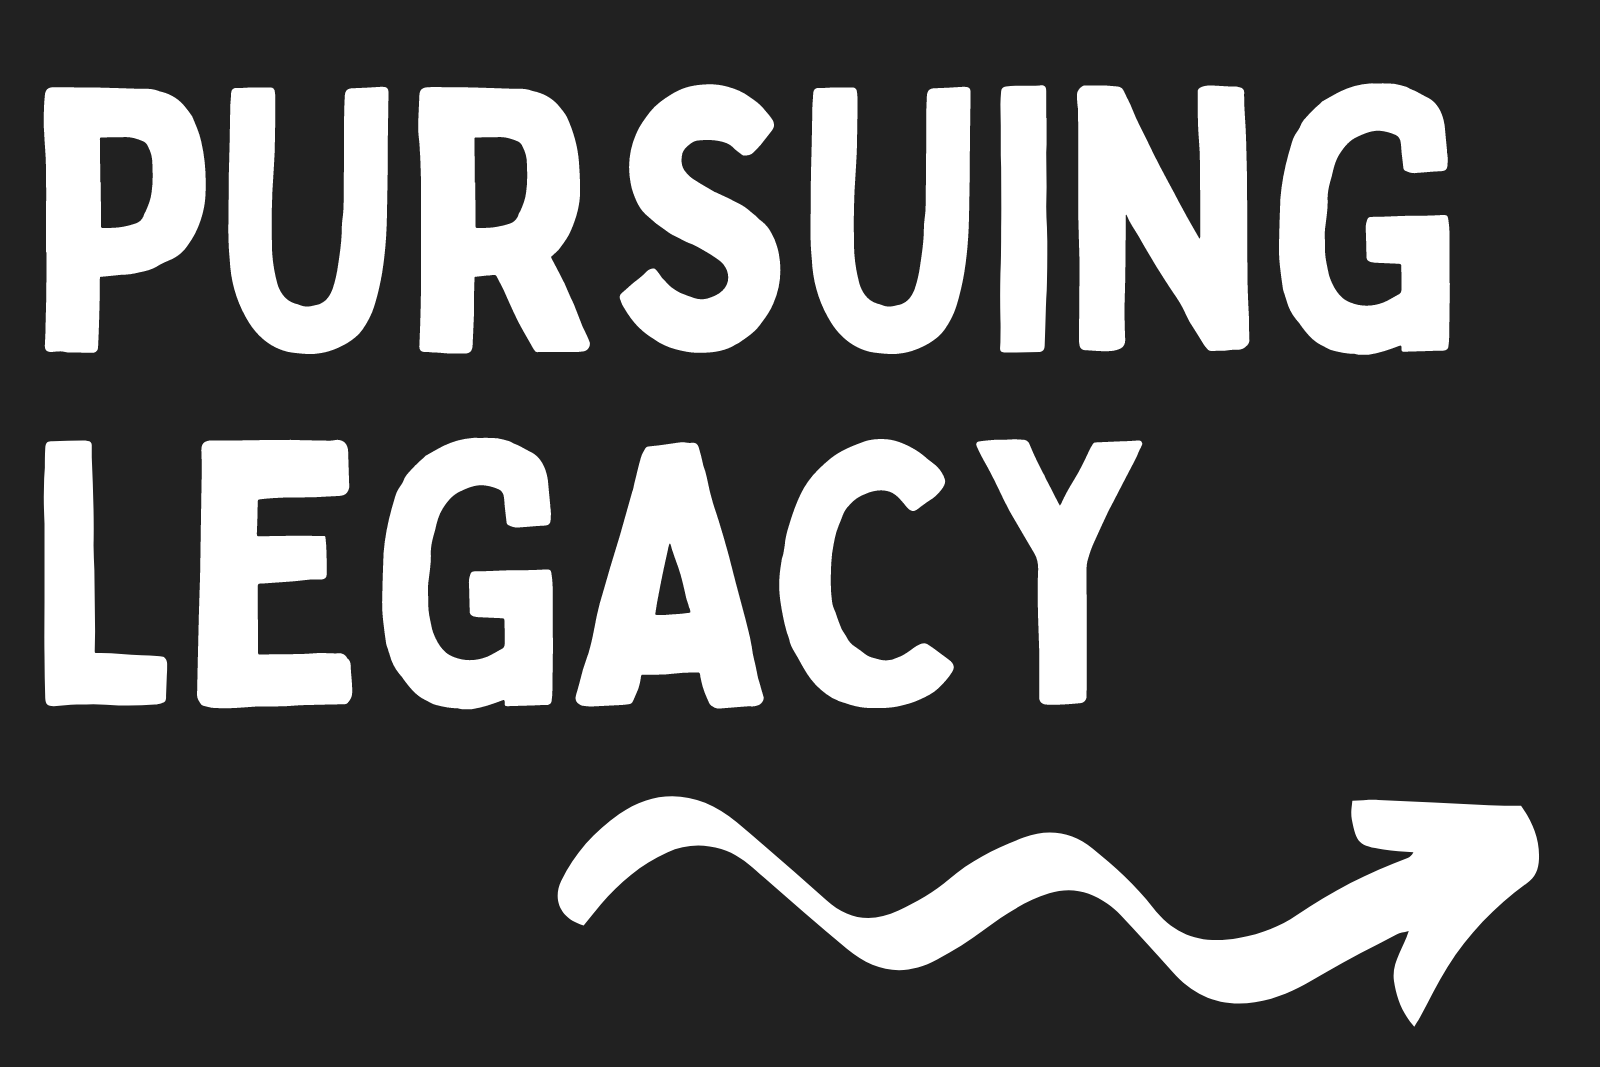 Pursuing legacy thumbnail